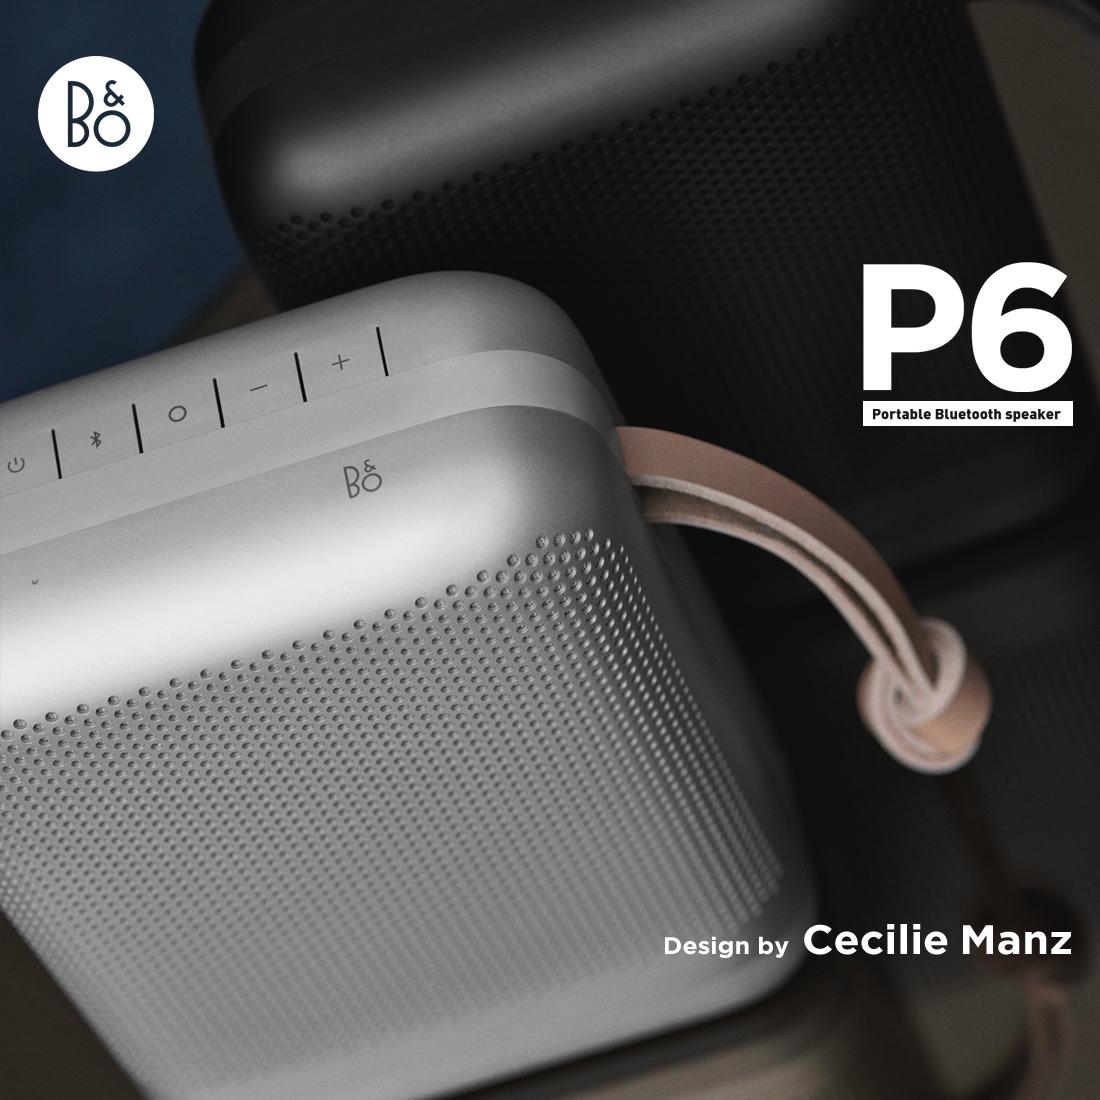 【B&O Play】Beoplay P6 ポータブル ワイヤレス スピーカーBang&Olufsen バングアンドオルフセン セシリエ マンツ 【コンビニ受取対応商品】